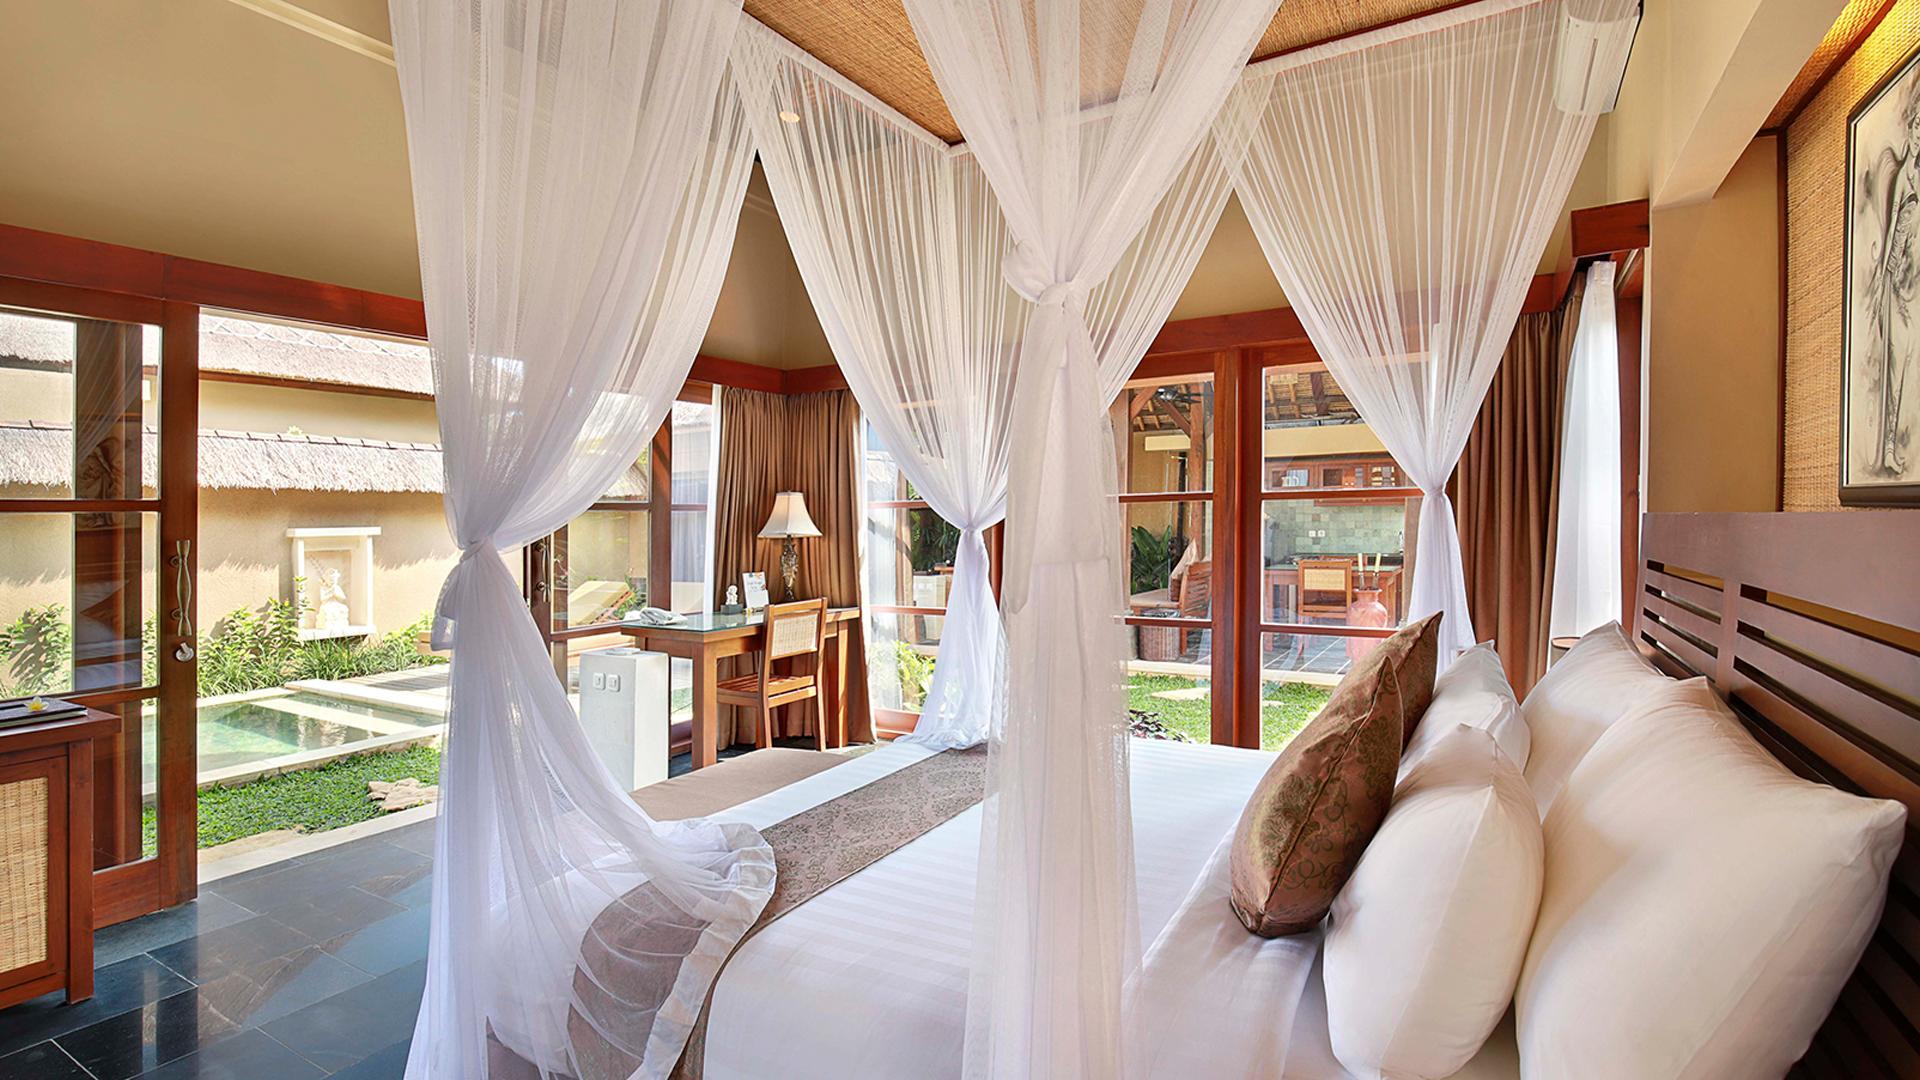 Two-Bedroom Deluxe Pool Villa image 1 at Ubud Nyuh Bali Resort & Spa - Older by Kabupaten Gianyar, Bali, Indonesia